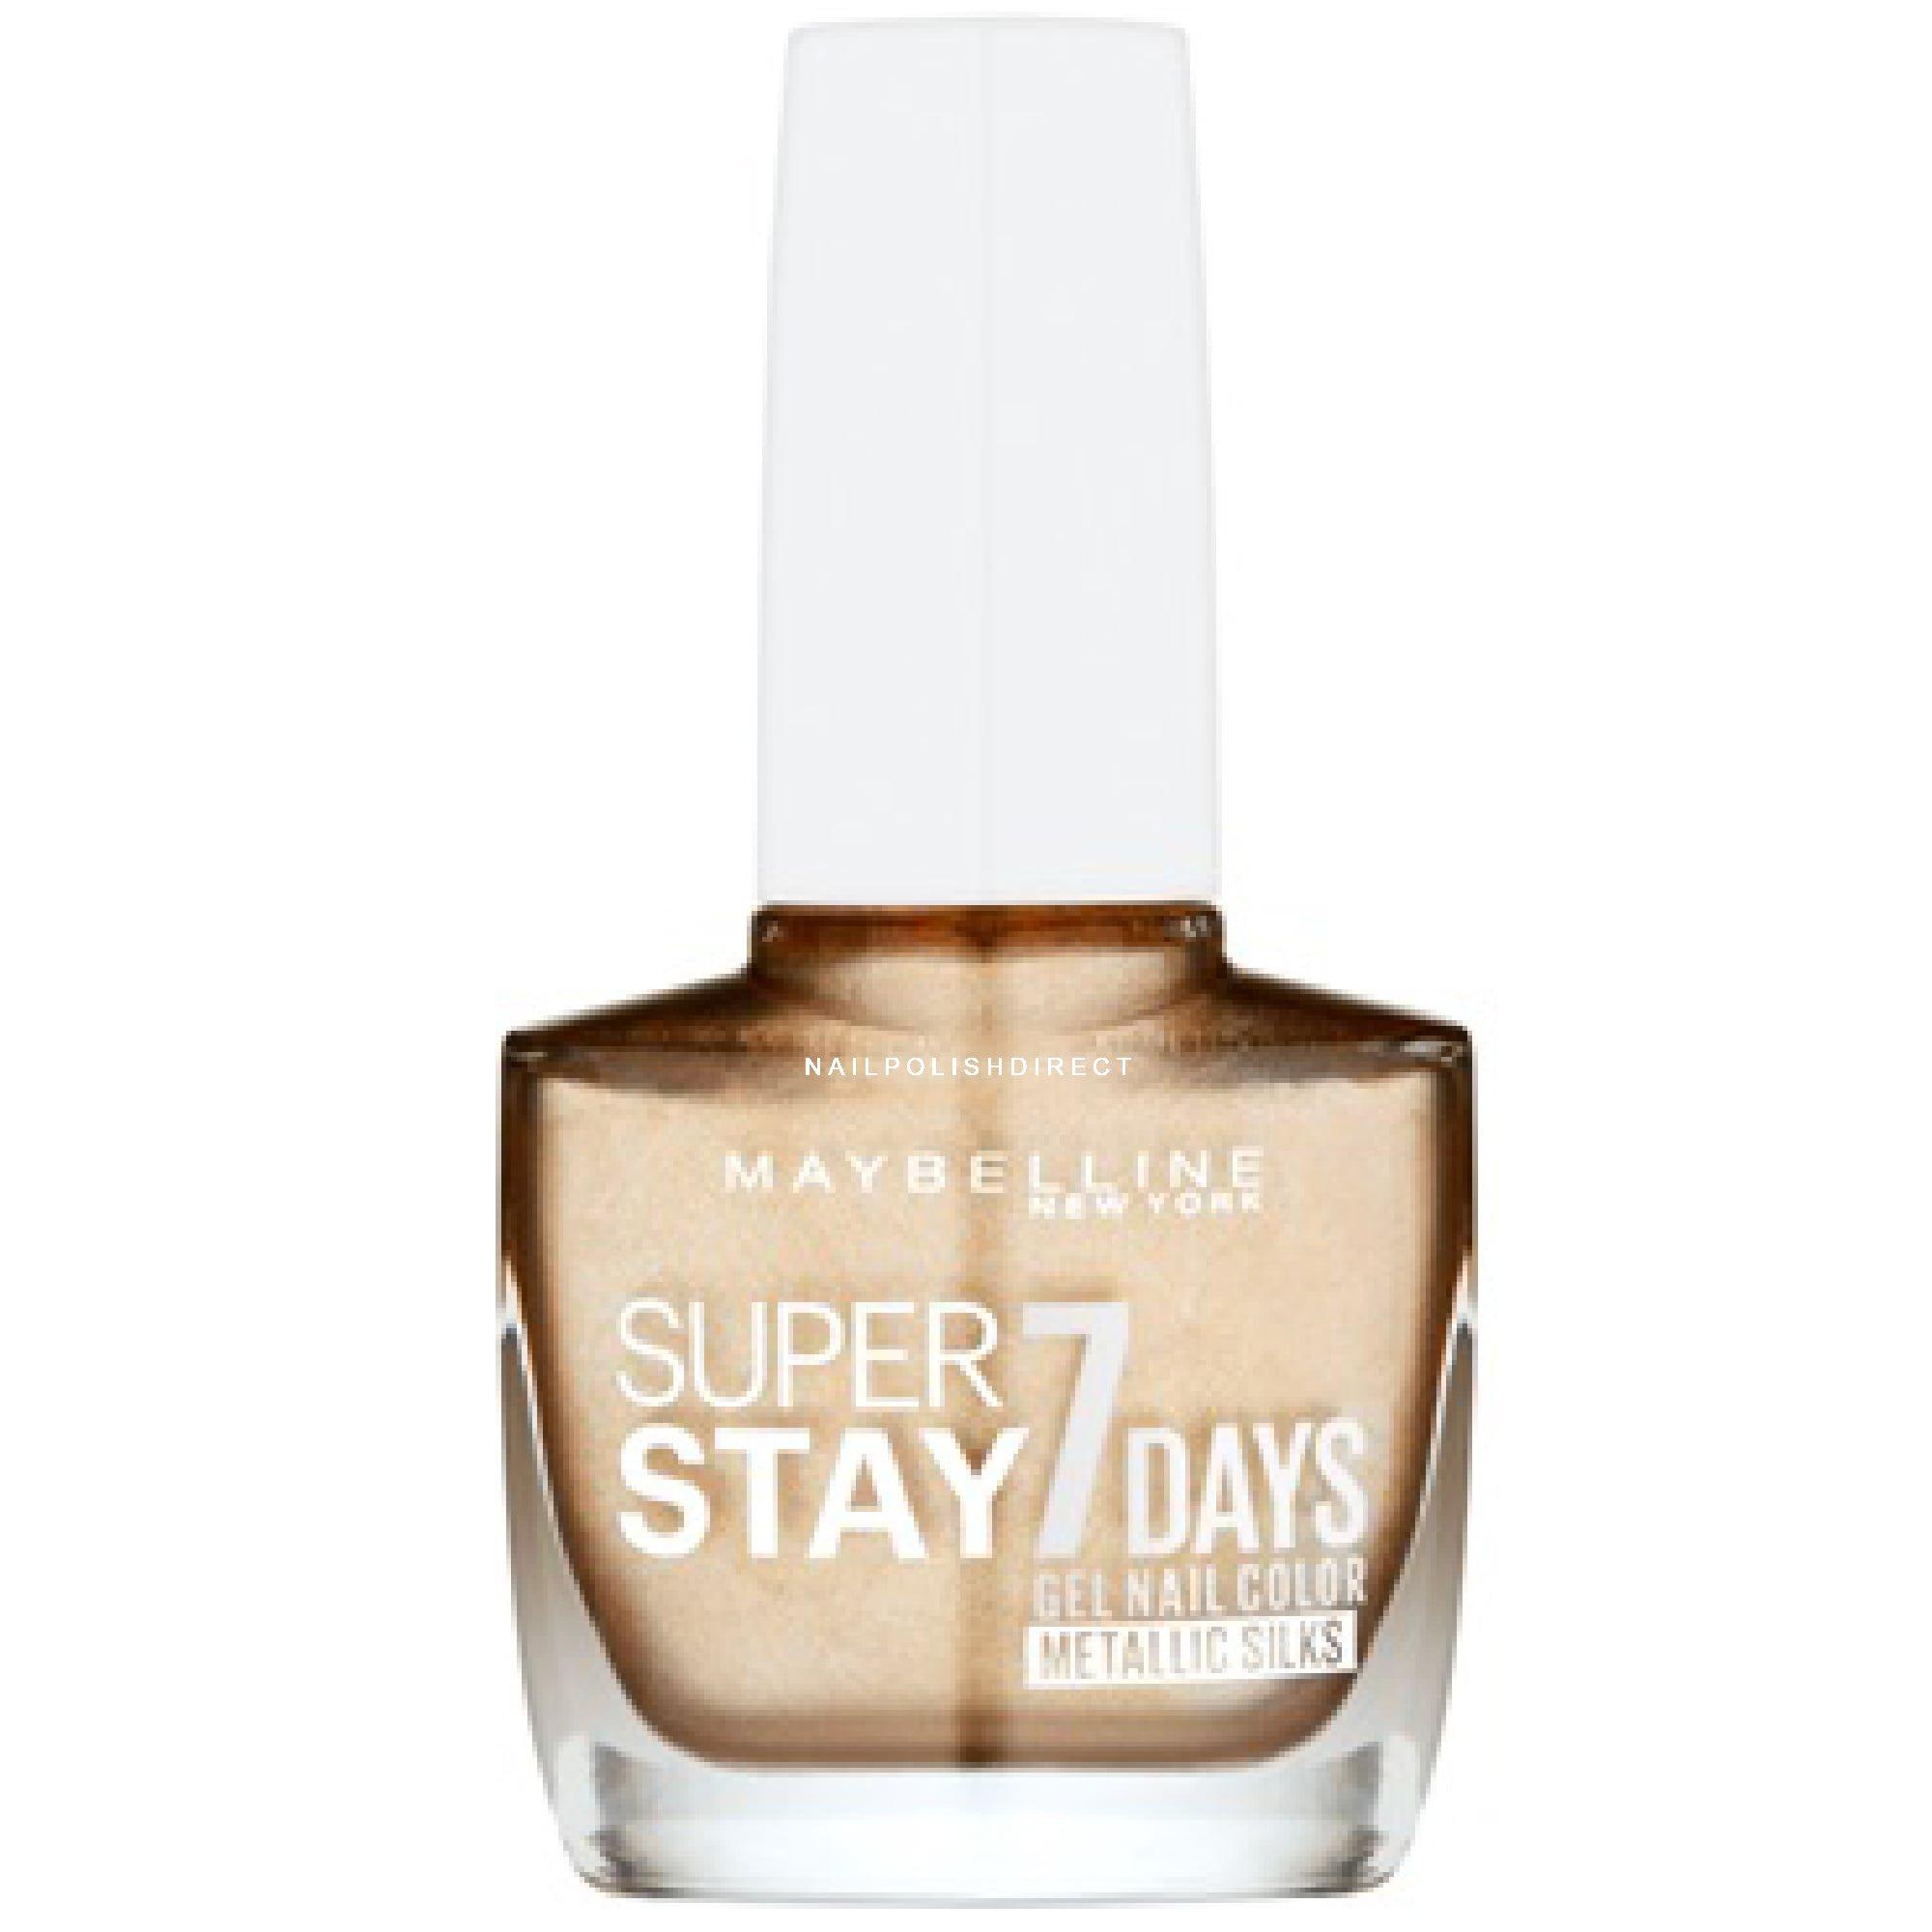 Gold Gel Nail Polish: Maybelline New York Super Stay 7 Days Nail Polish